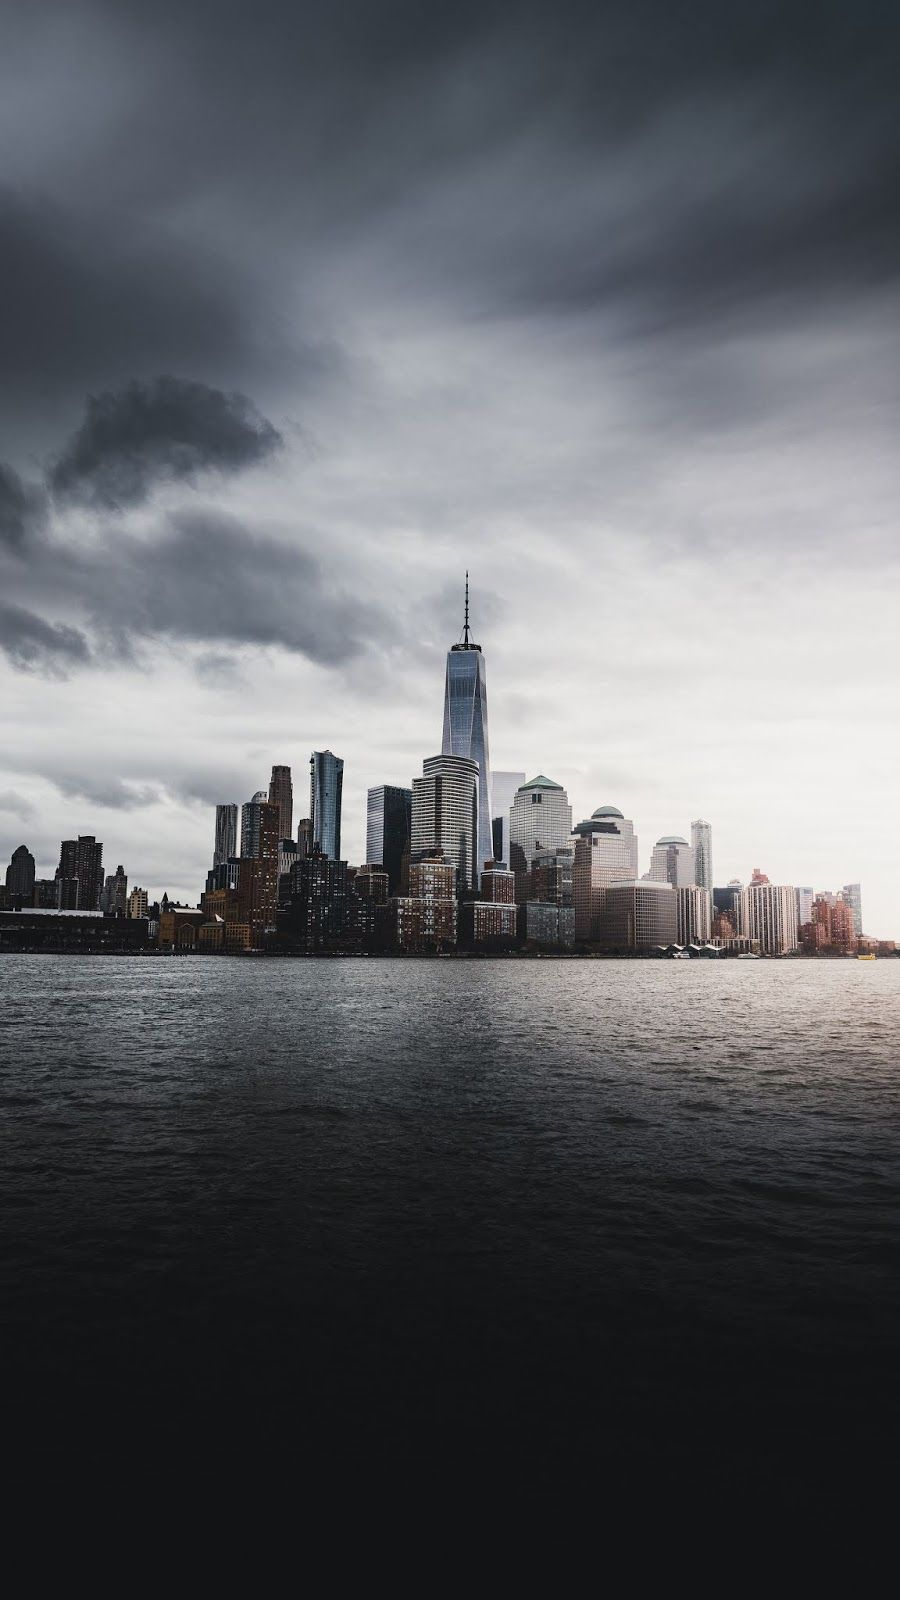 New York Usa Skyscrapers New York Wallpaper Usa Wallpaper Cityscape